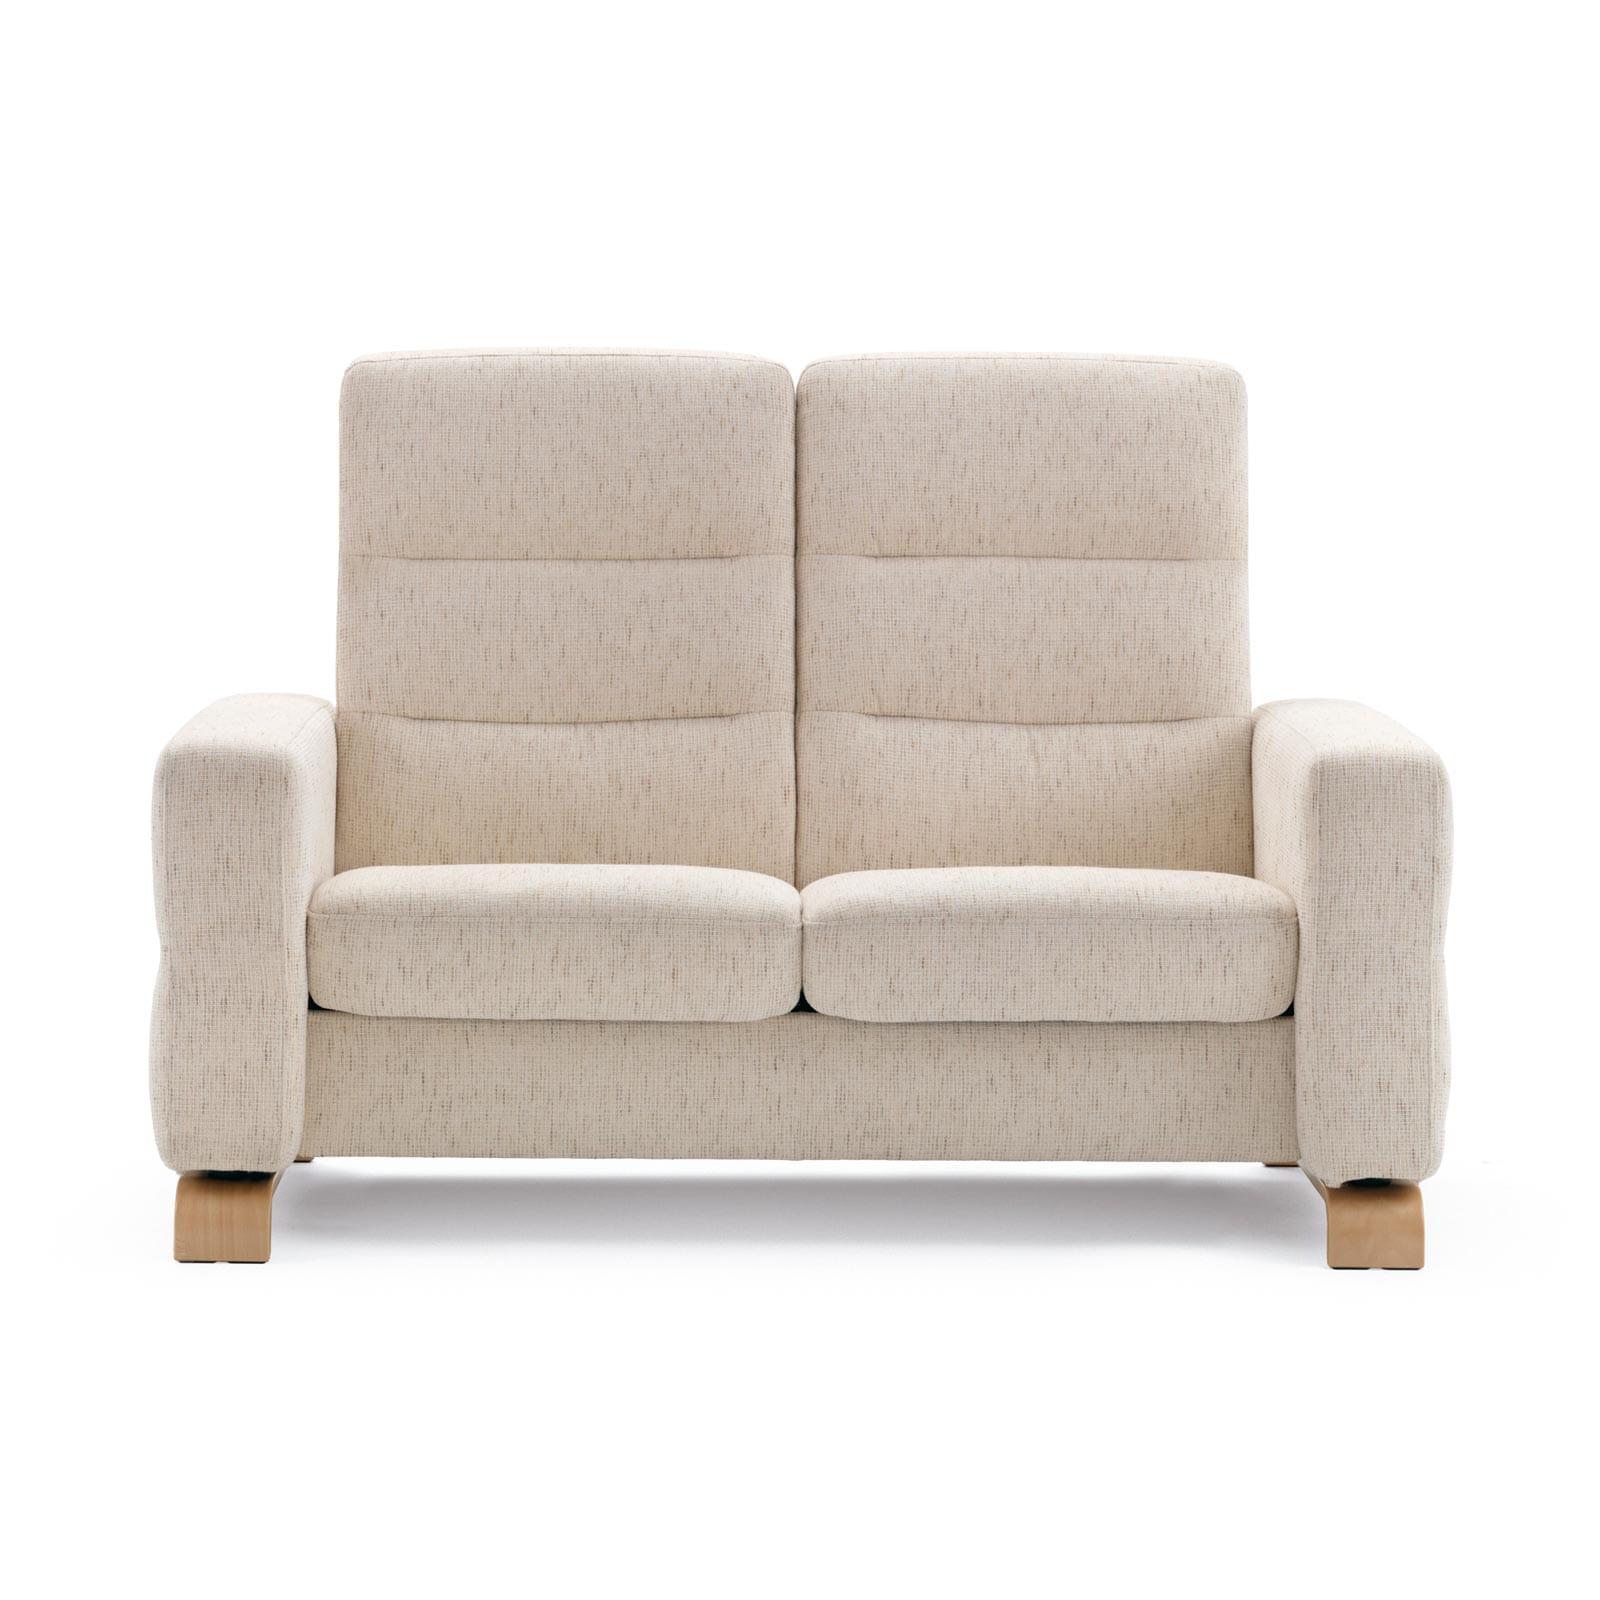 Super Stressless Sofa 2 Sitzer Wave M Hoch Stoff Silva Light Beige Forskolin Free Trial Chair Design Images Forskolin Free Trialorg